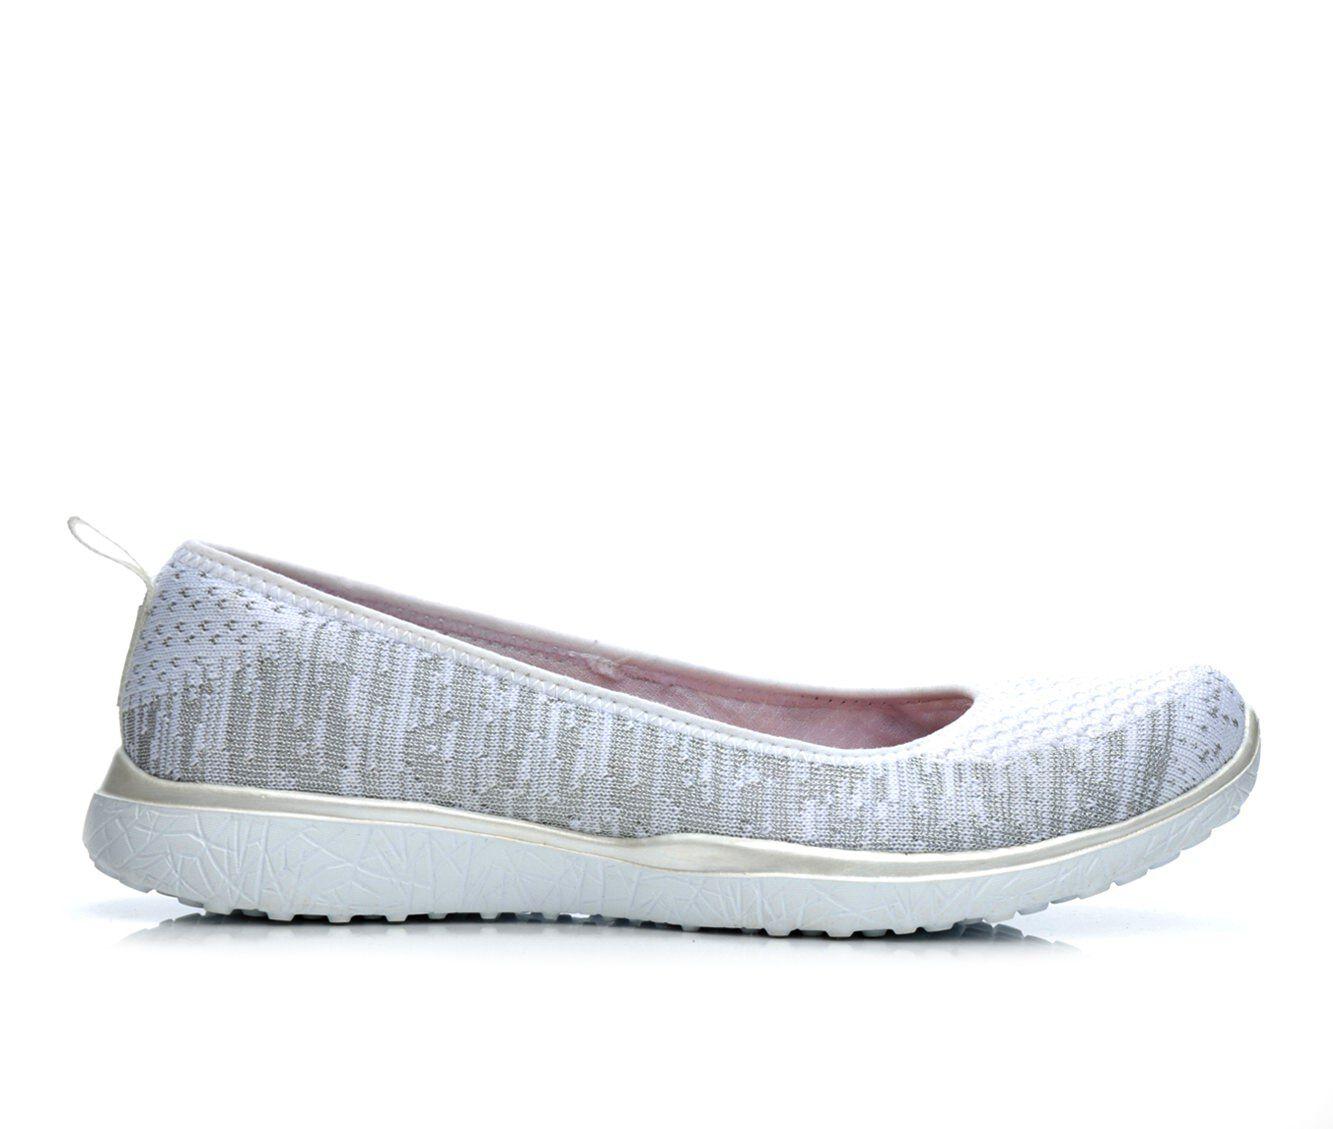 skechers ballet flats Silver